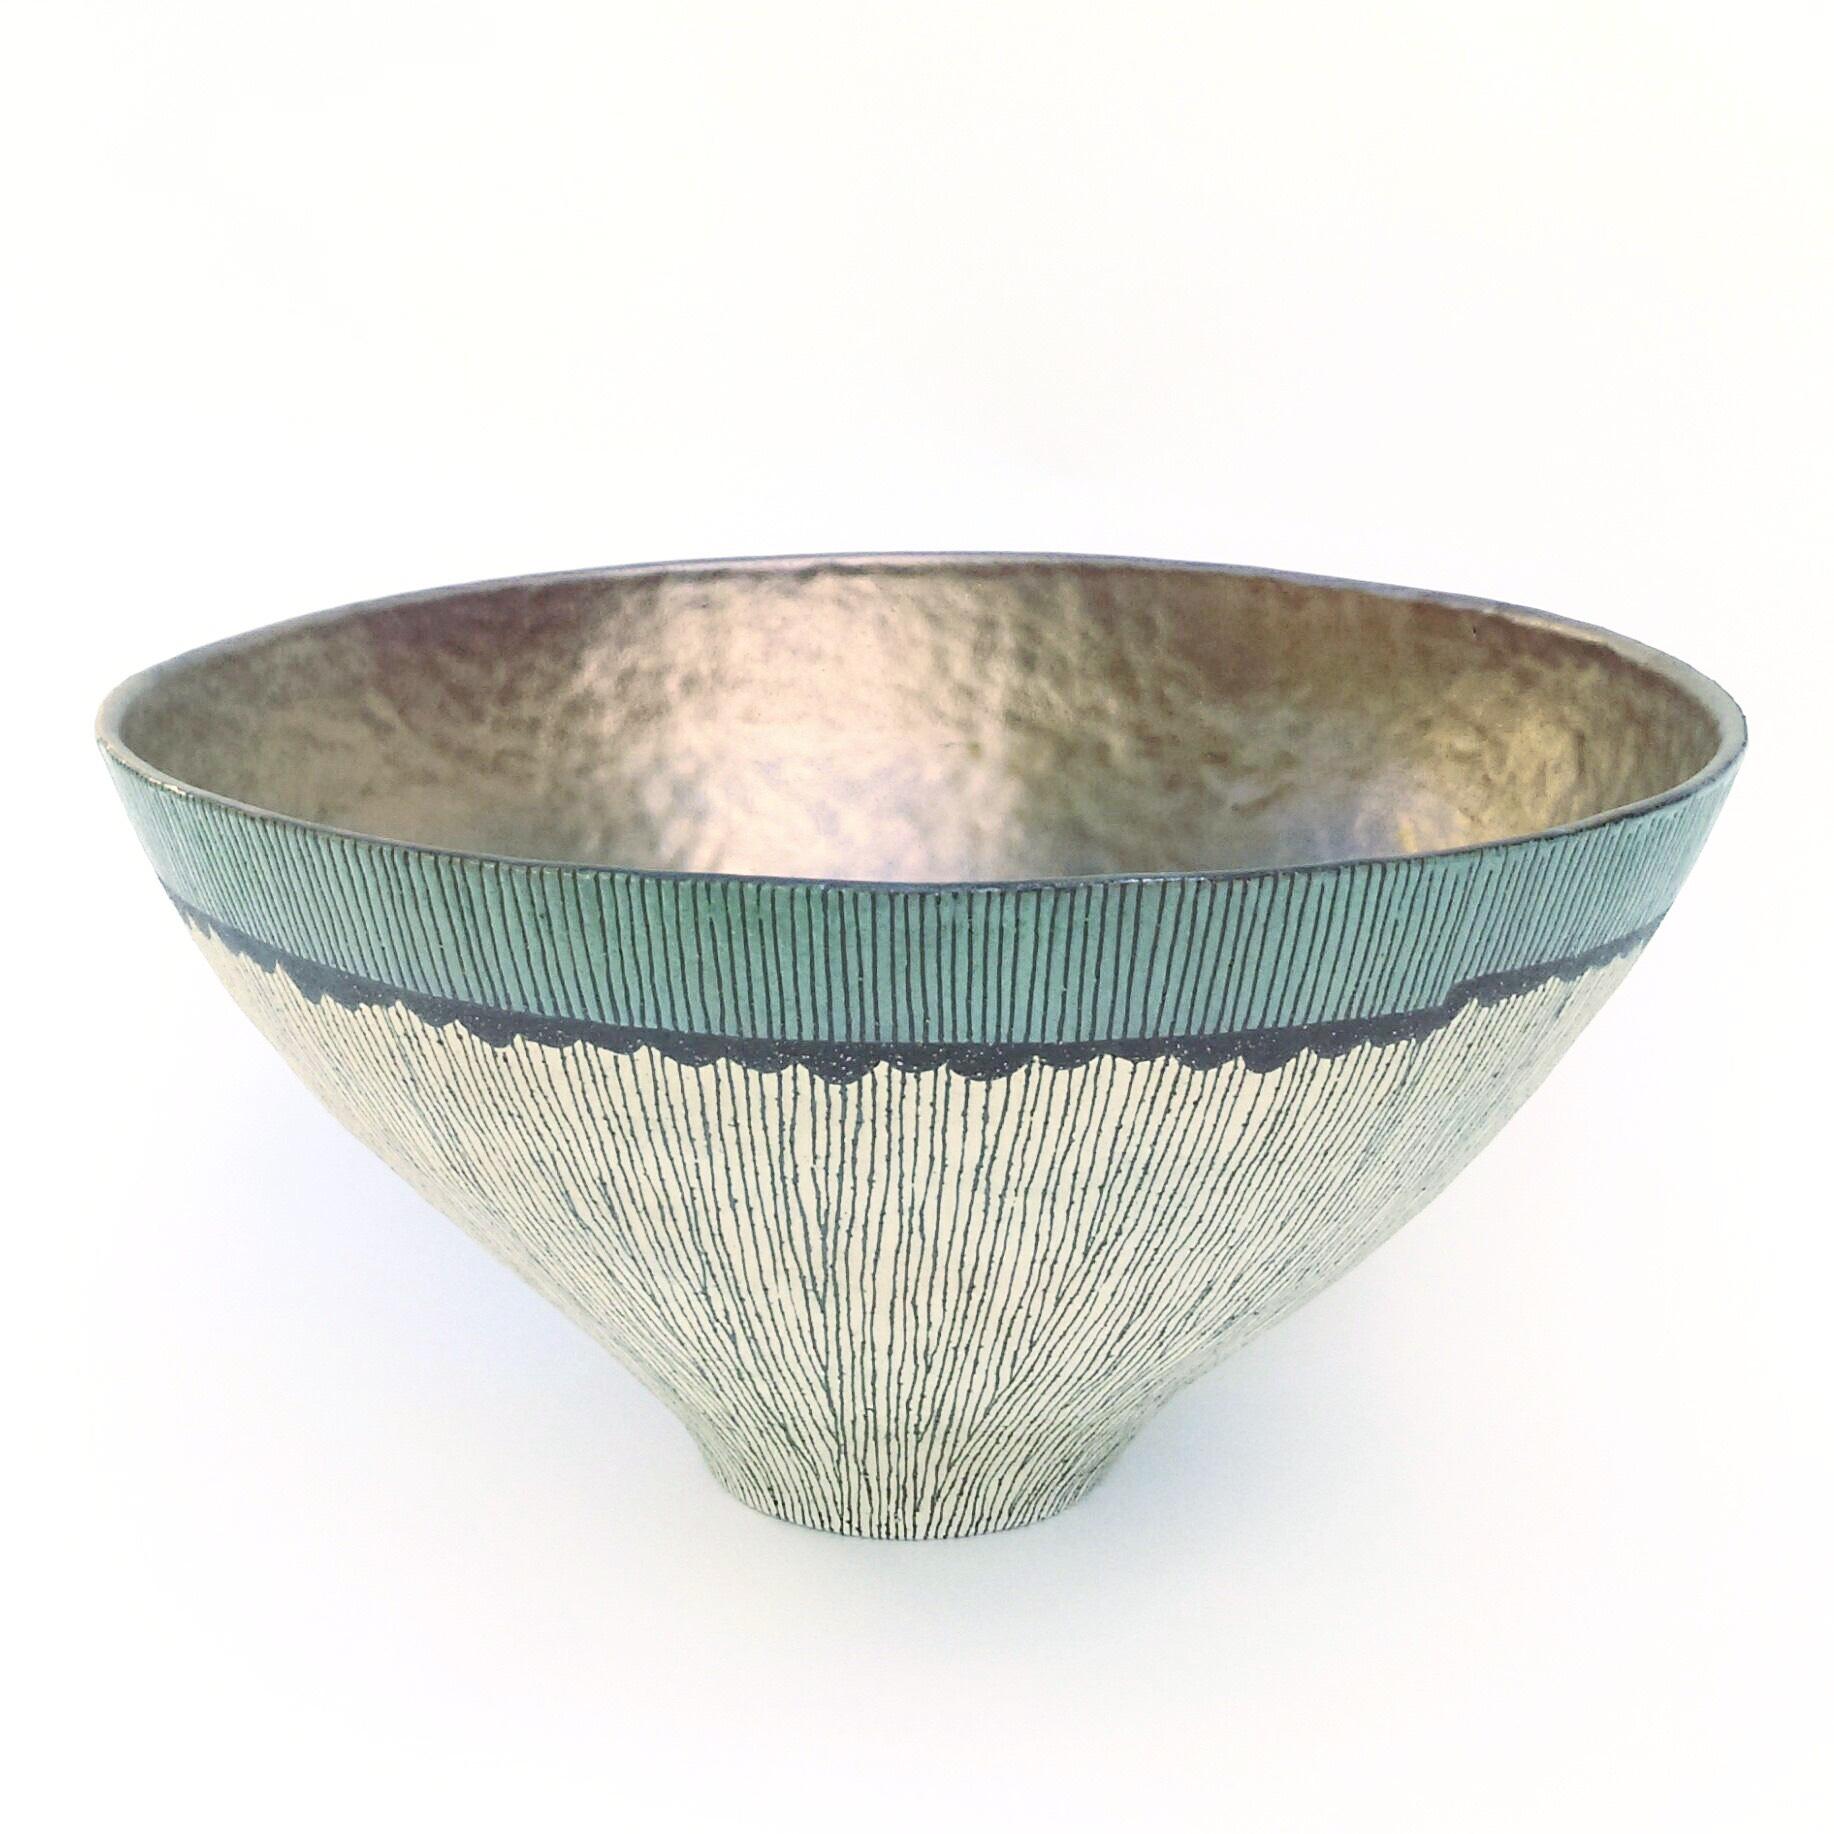 Liz Pechacek - Bowl